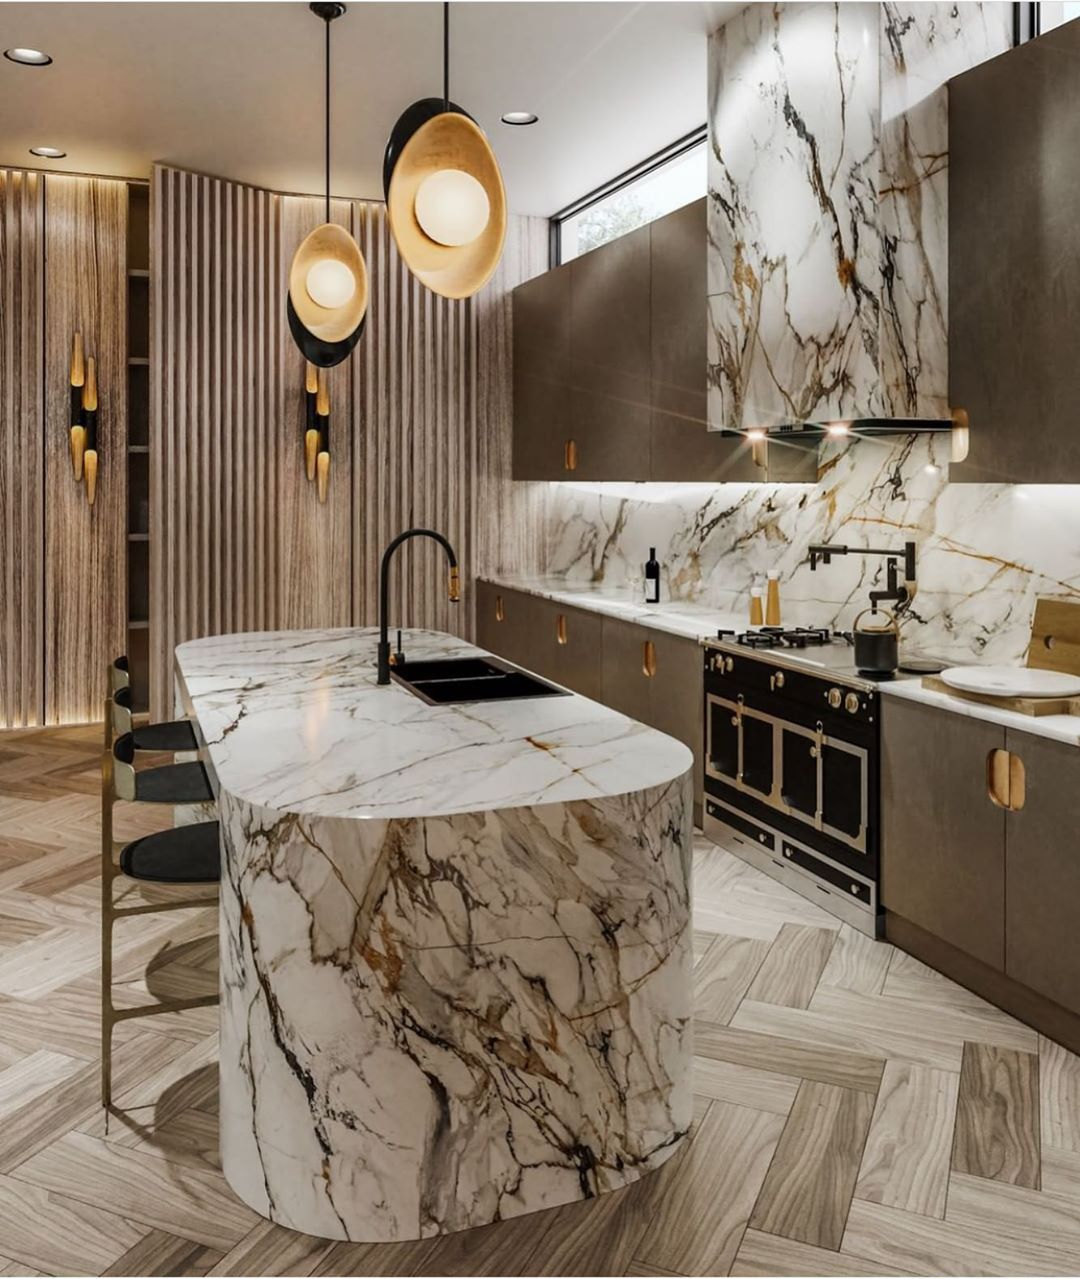 Photo of Kitchen decor ideas themes color schemes